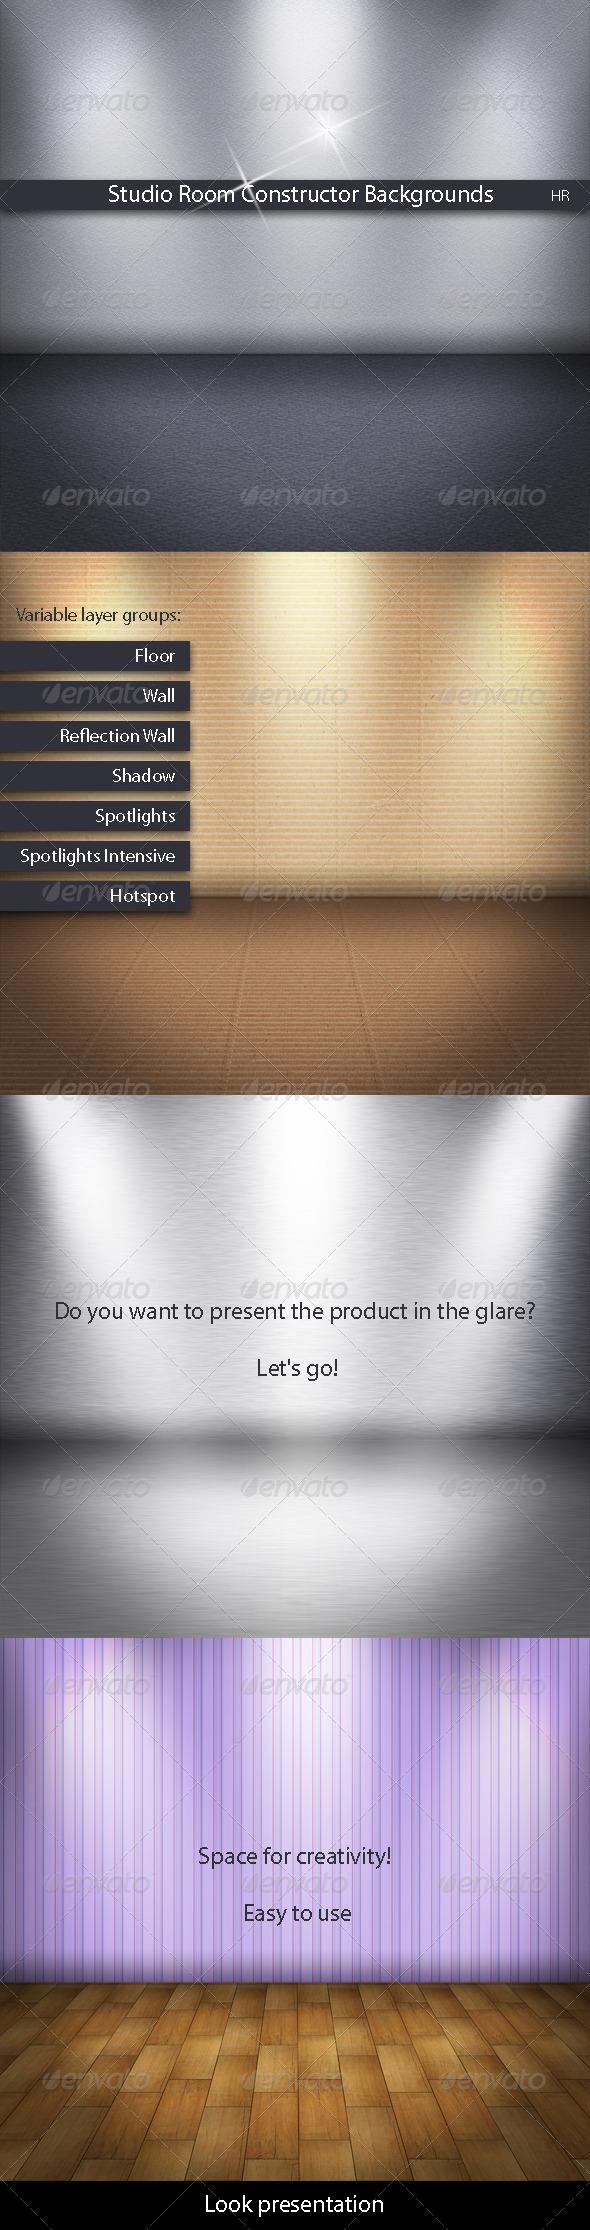 Studio Room Constructor Backgrounds - Backgrounds Graphics